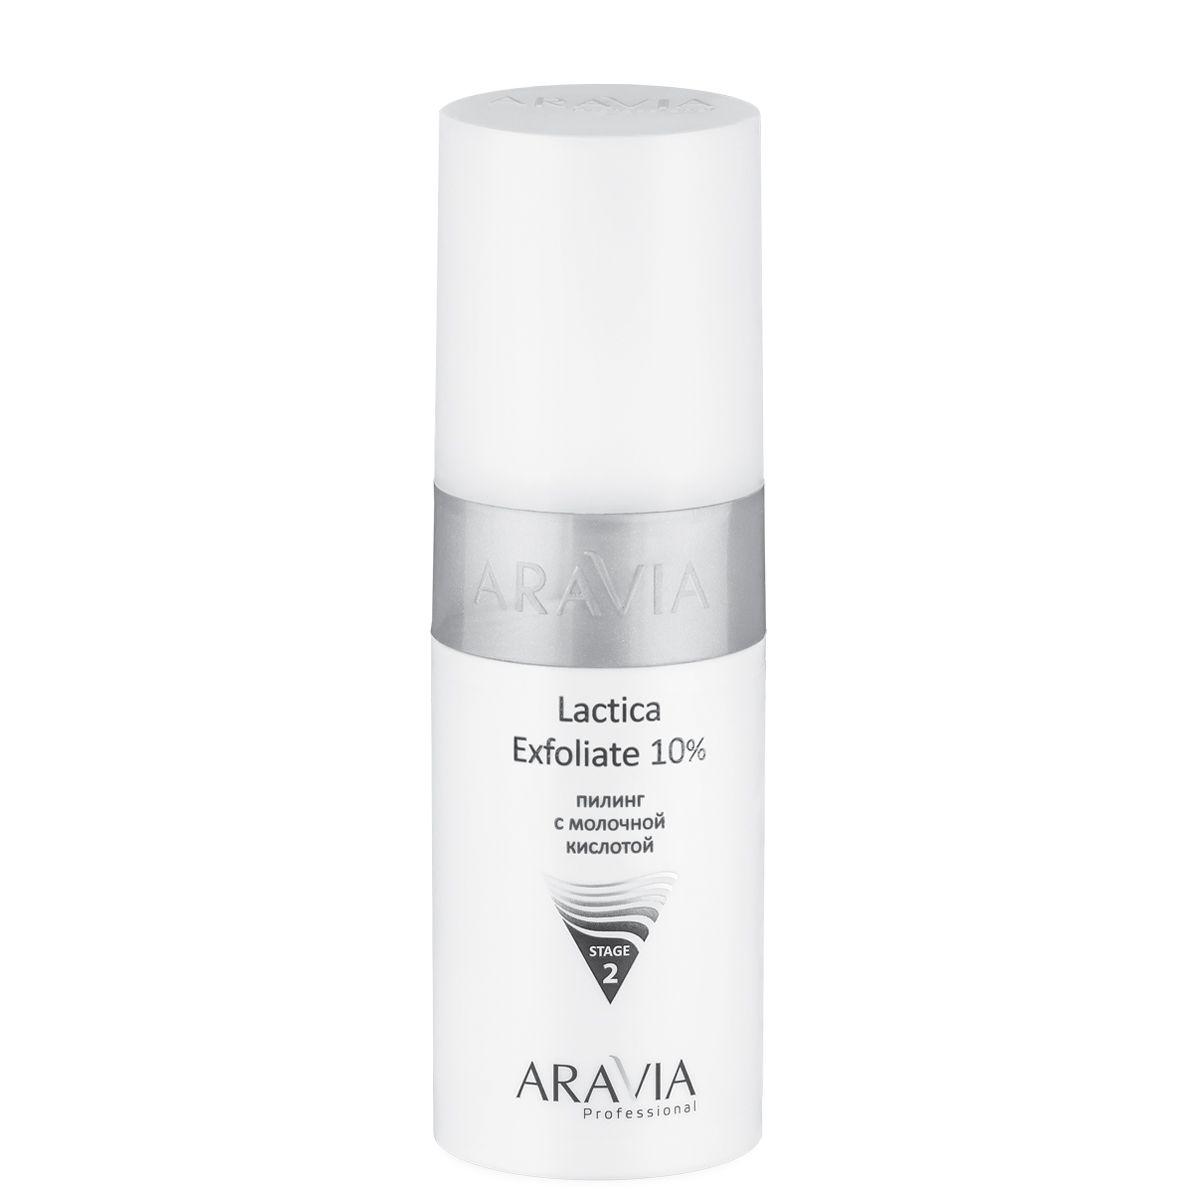 Peeling With Lactic Acid Latica Exfoliate 10%, 150 Ml, Aravia Professional